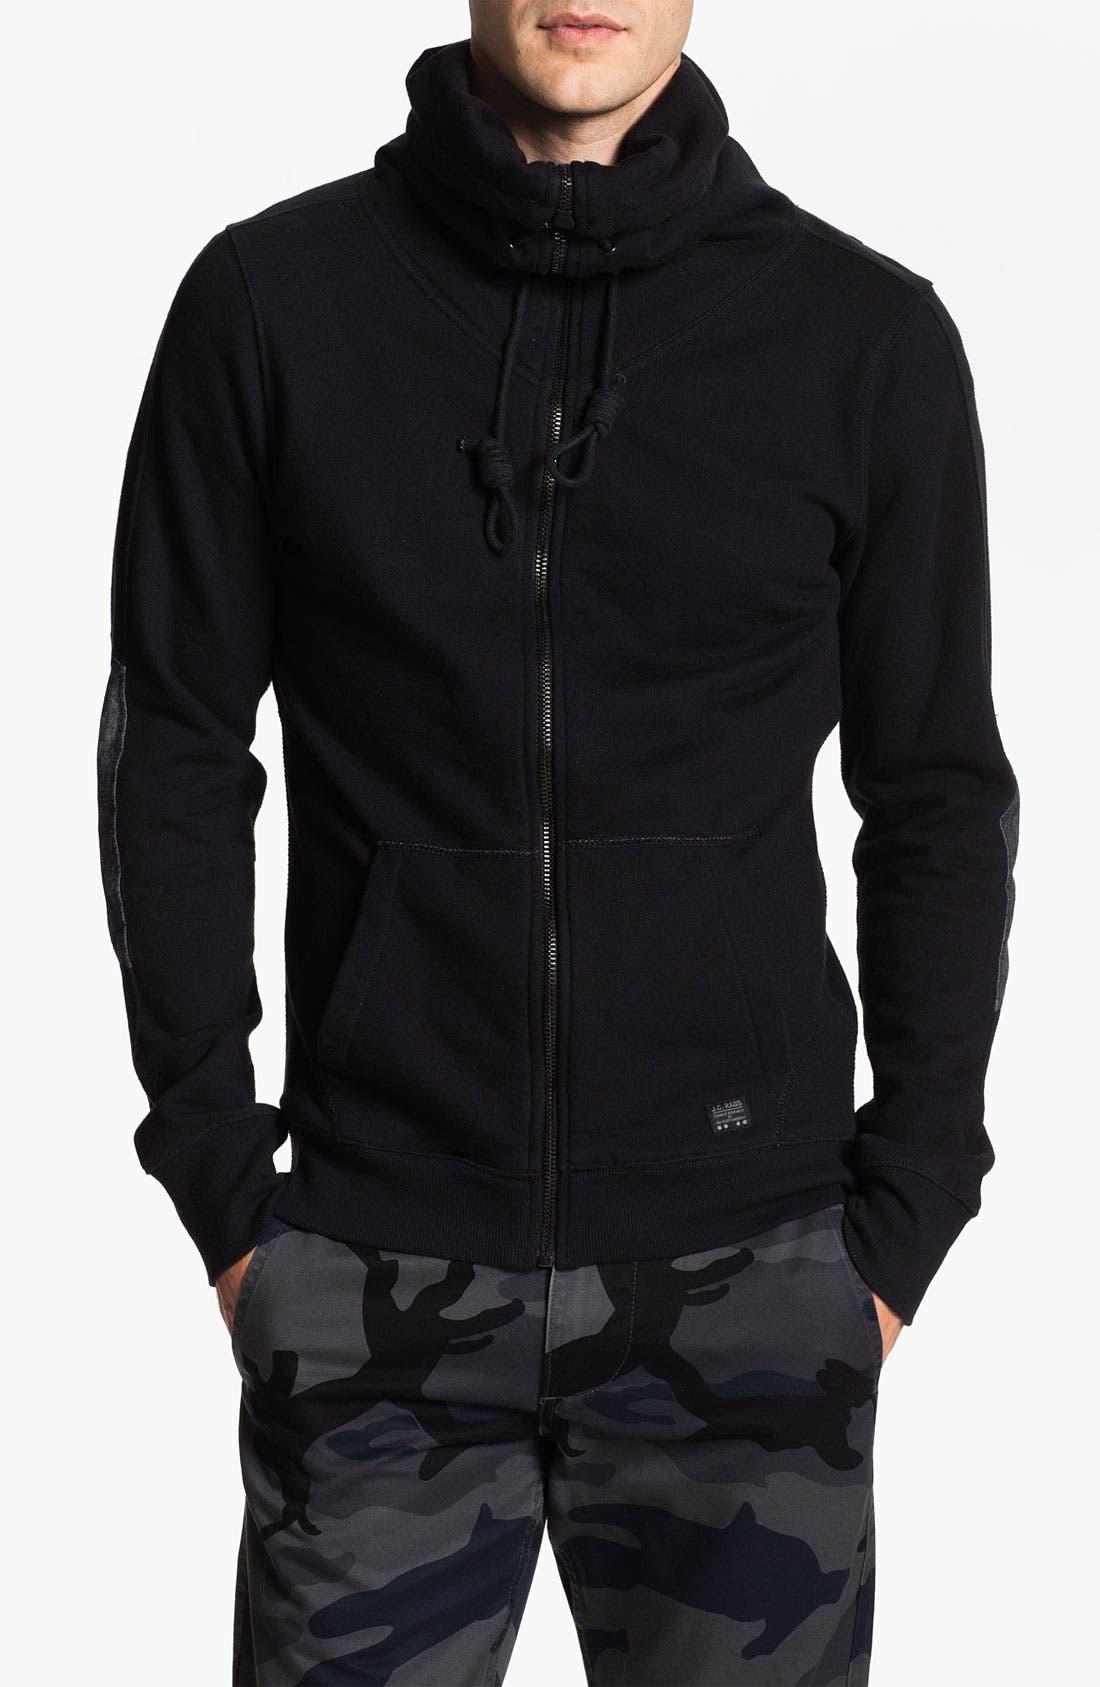 Main Image - J.C. Rags Extra Trim Fit Jacket